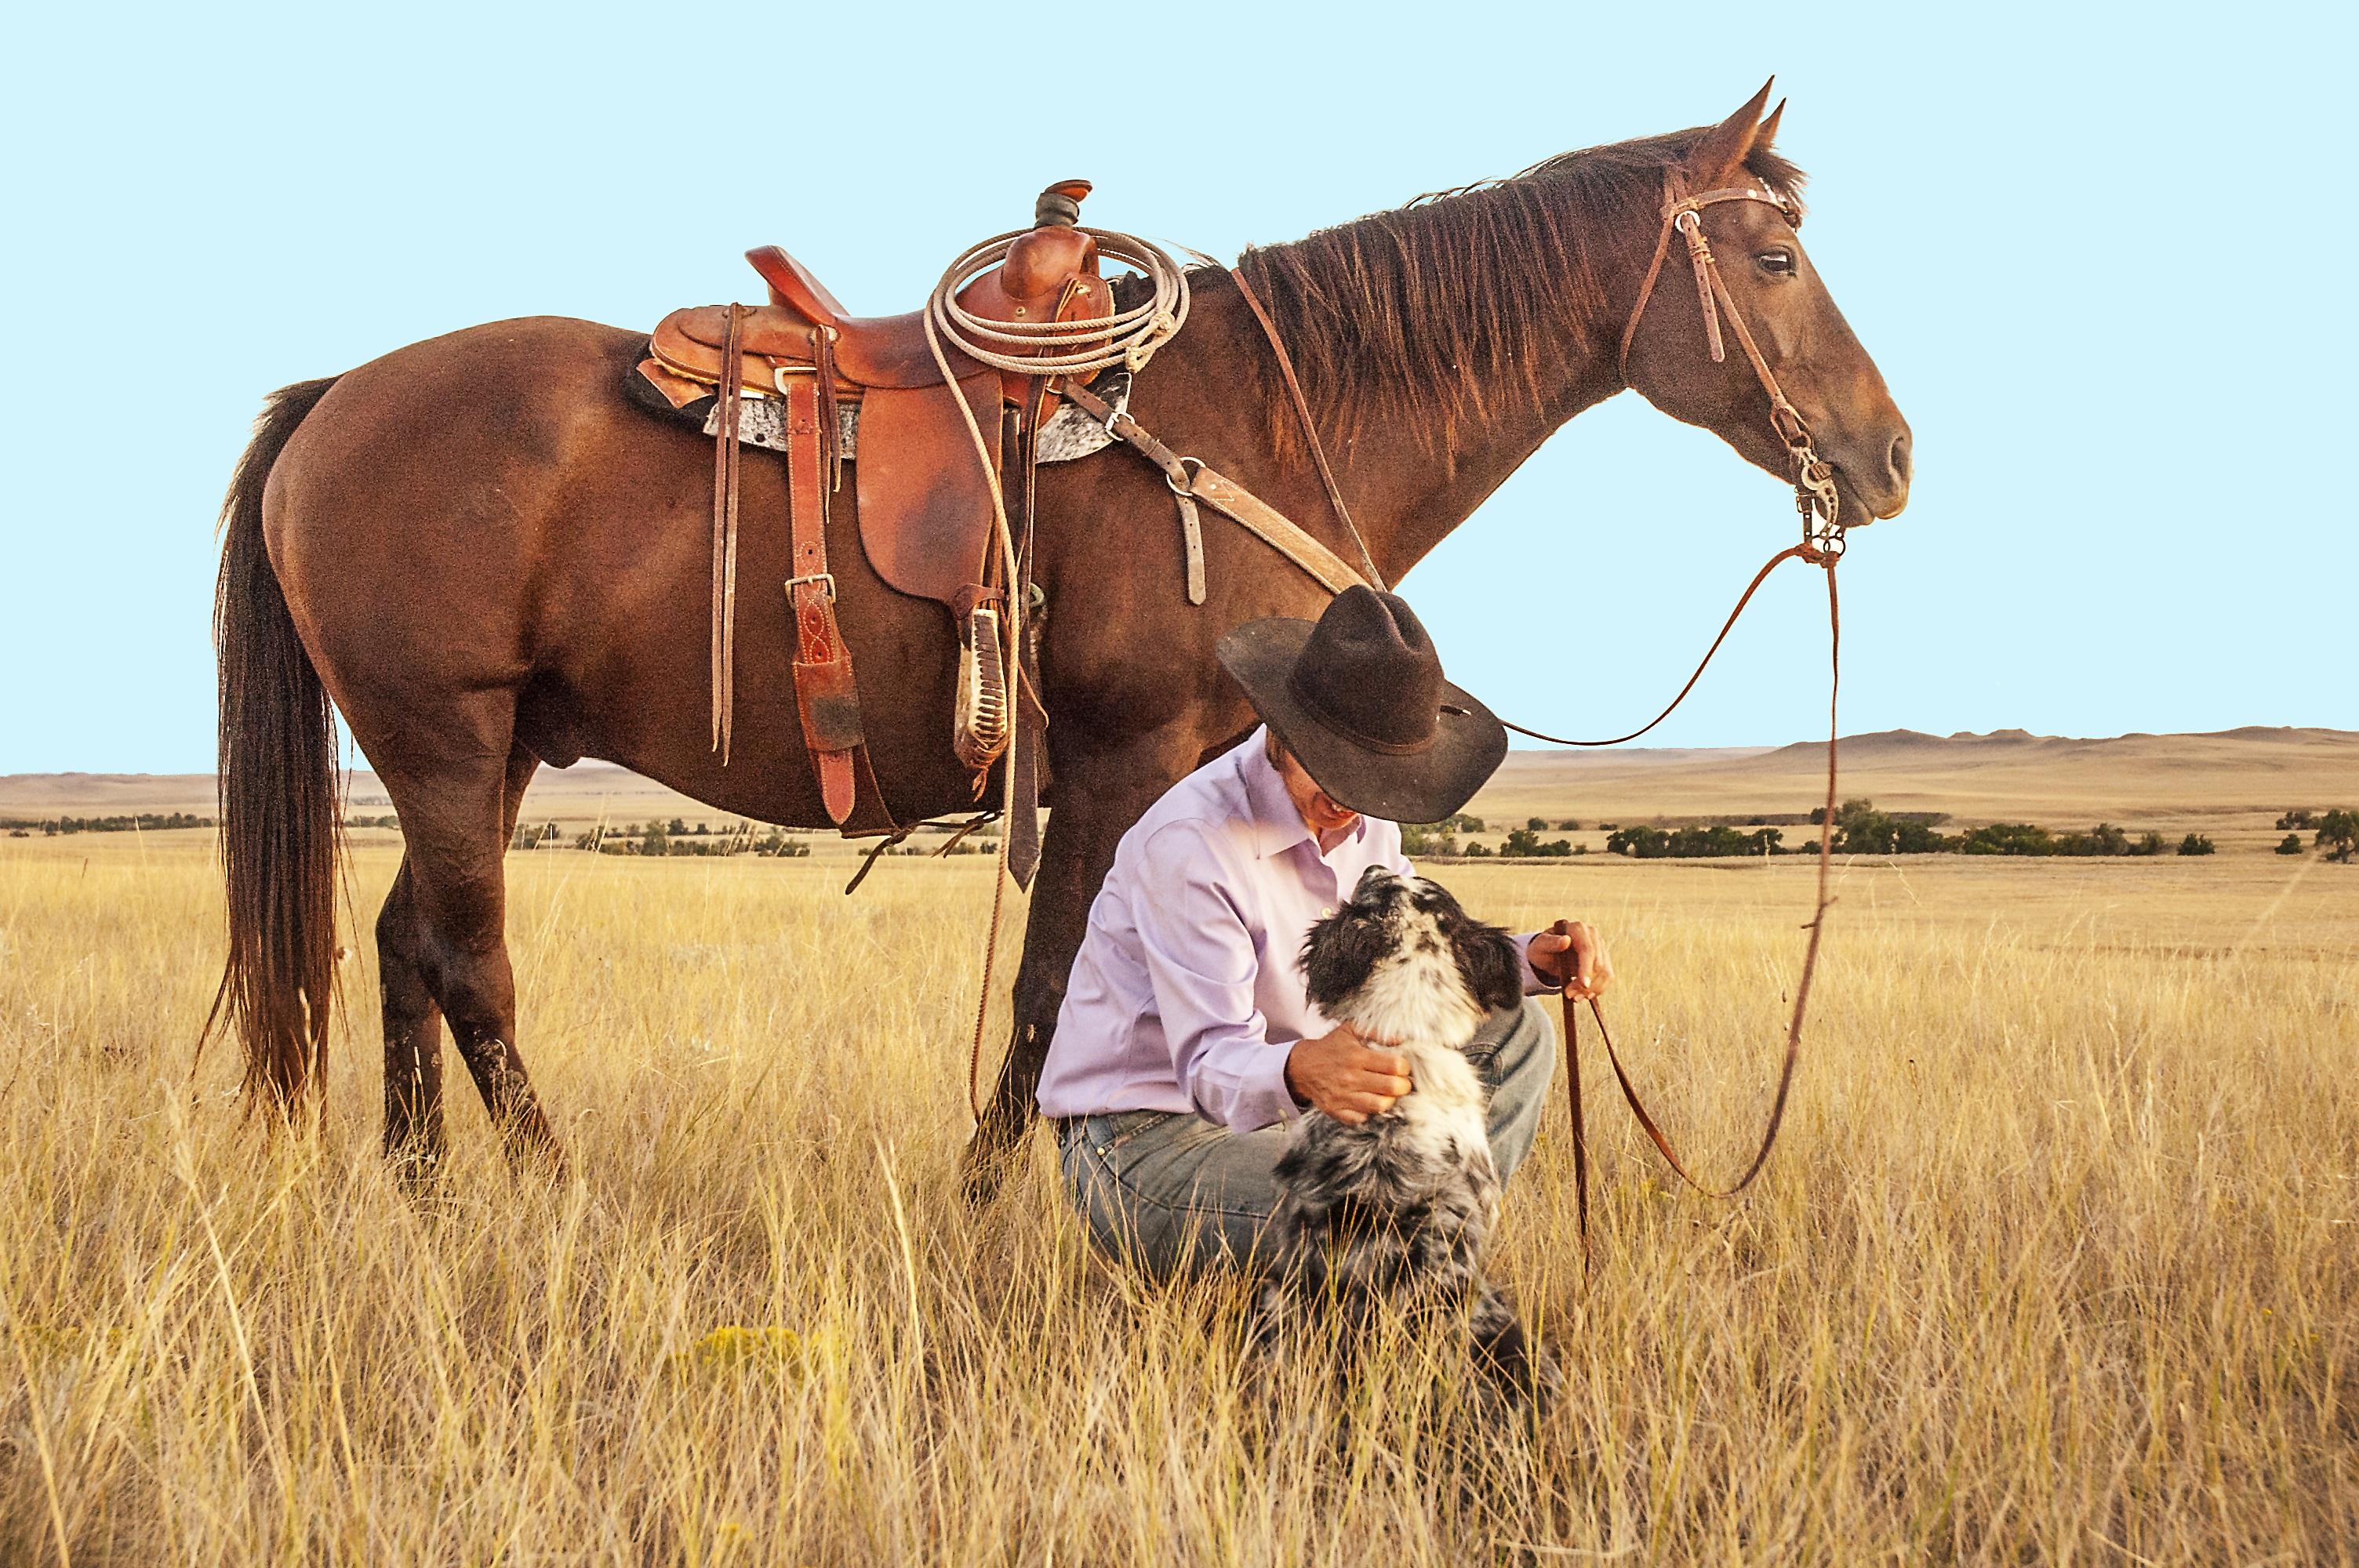 Cowboy: Dog, Cowboy, Horse, Portrait, Ranch